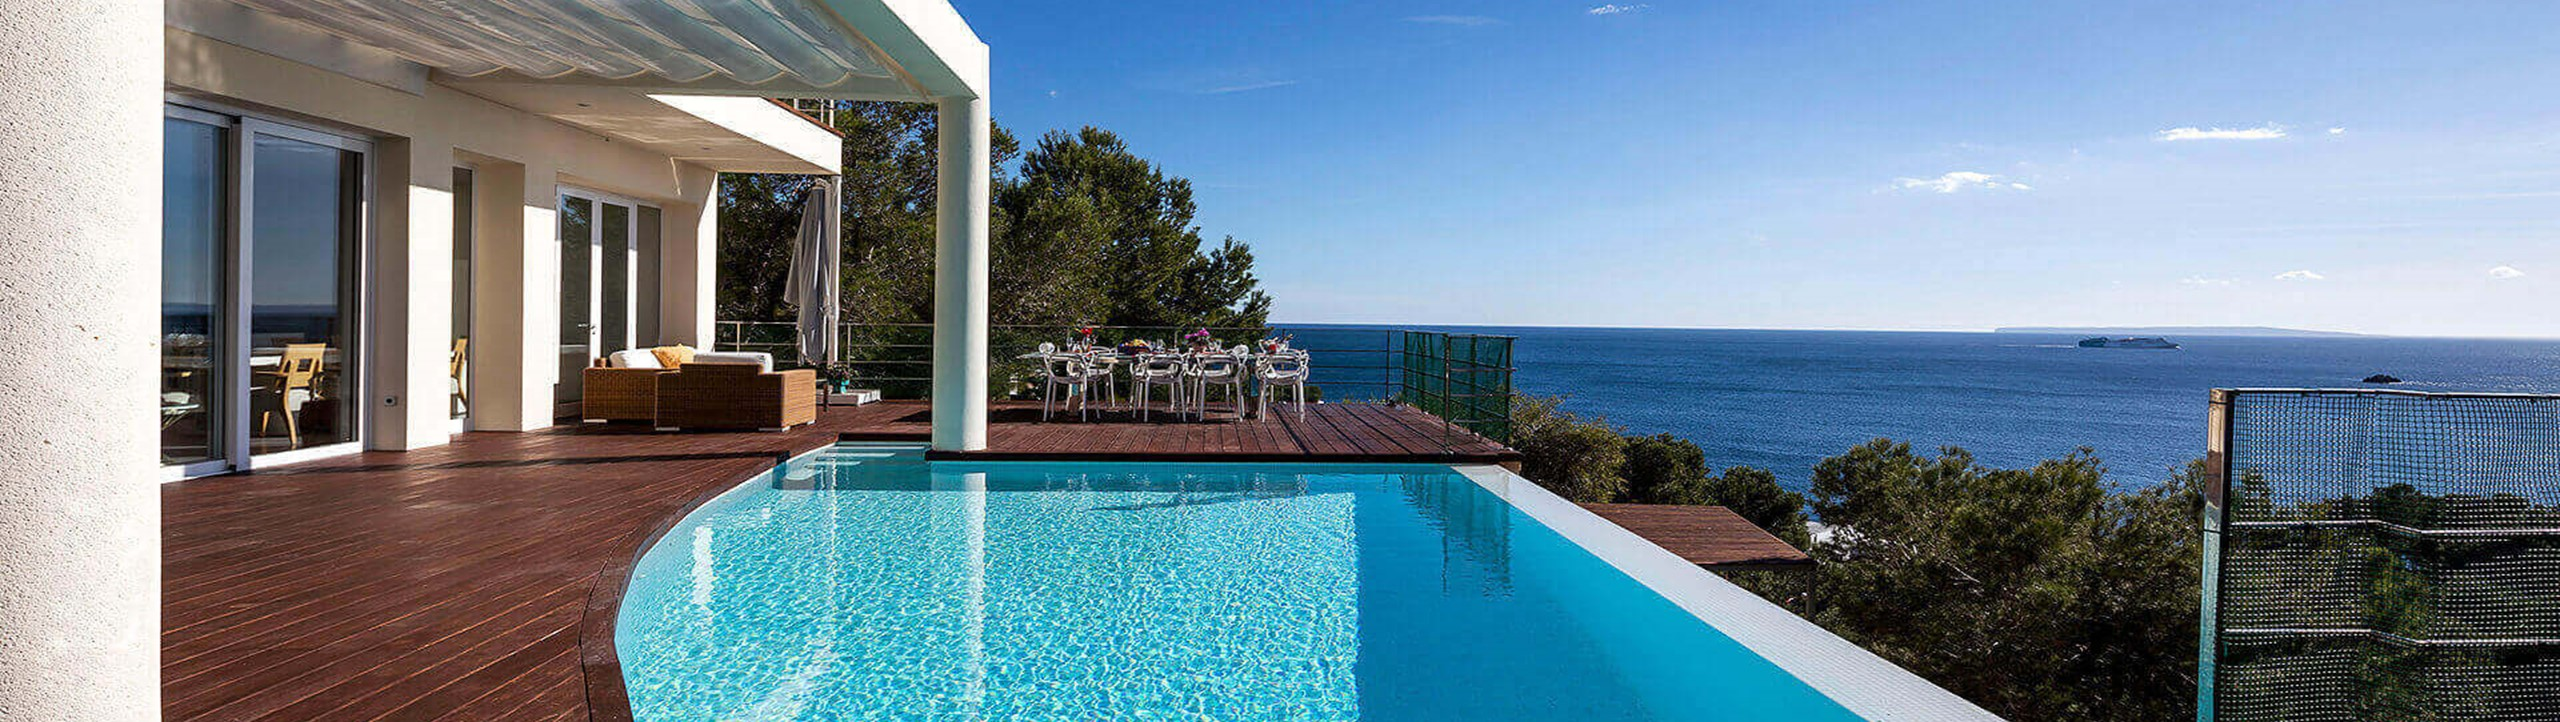 Villa Divinity Ibiza 3 Roca Llisa